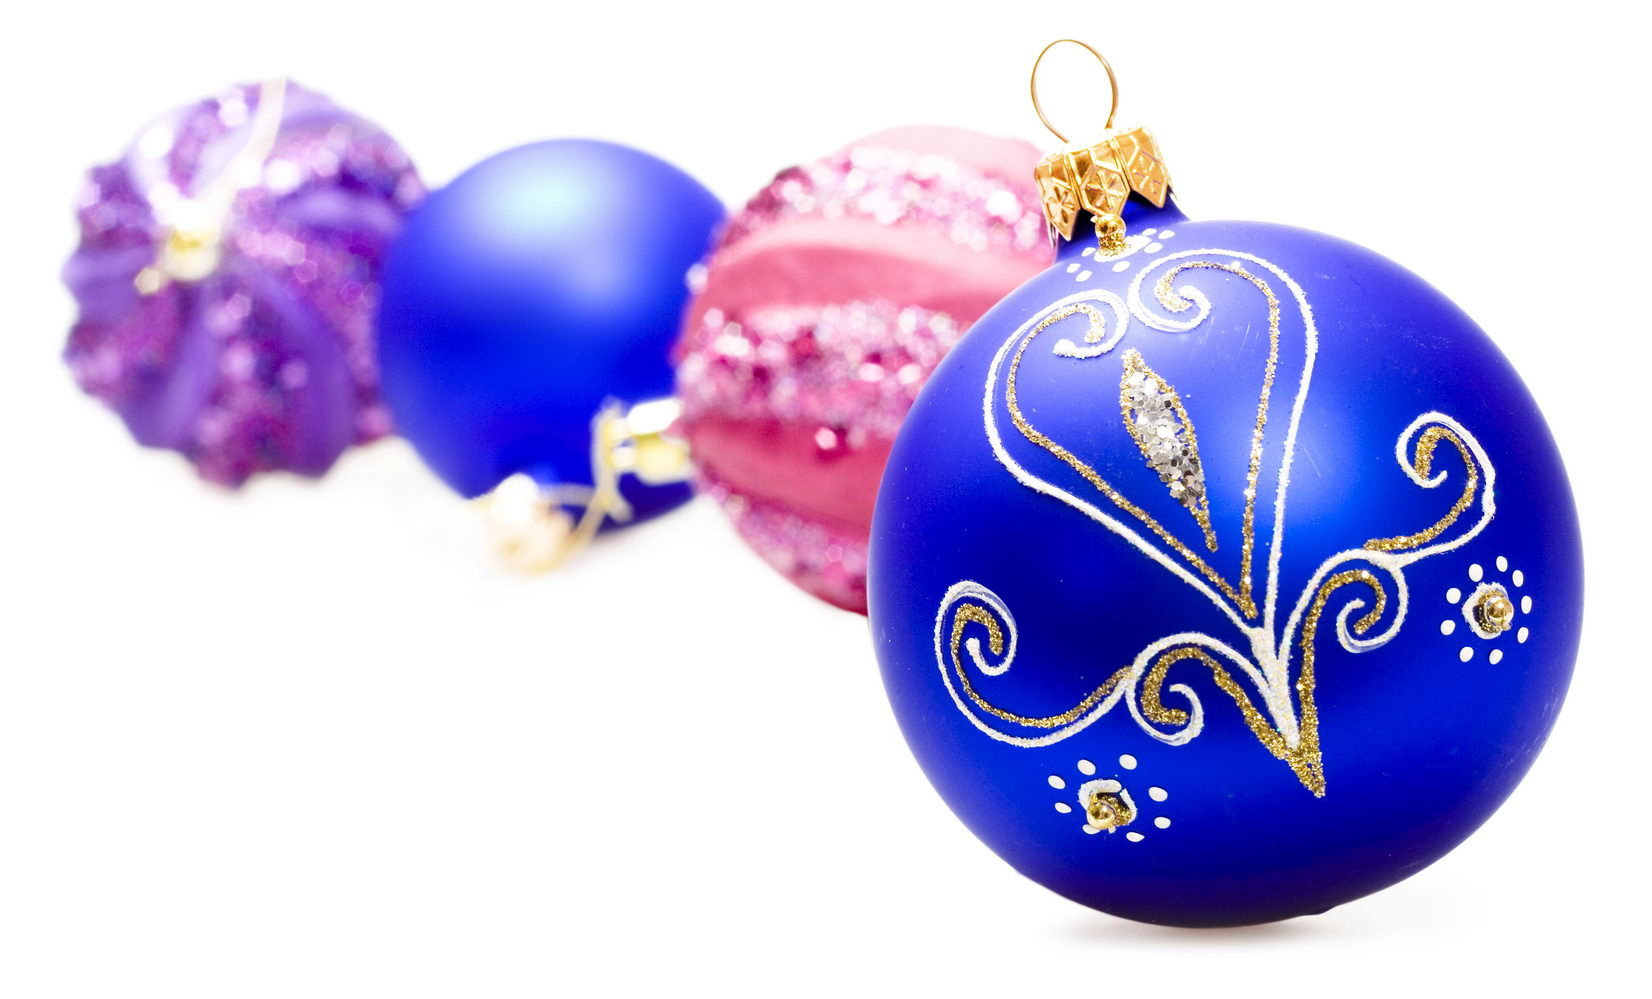 Christmas balls, Ball, Holiday, Winter, White, HQ Photo